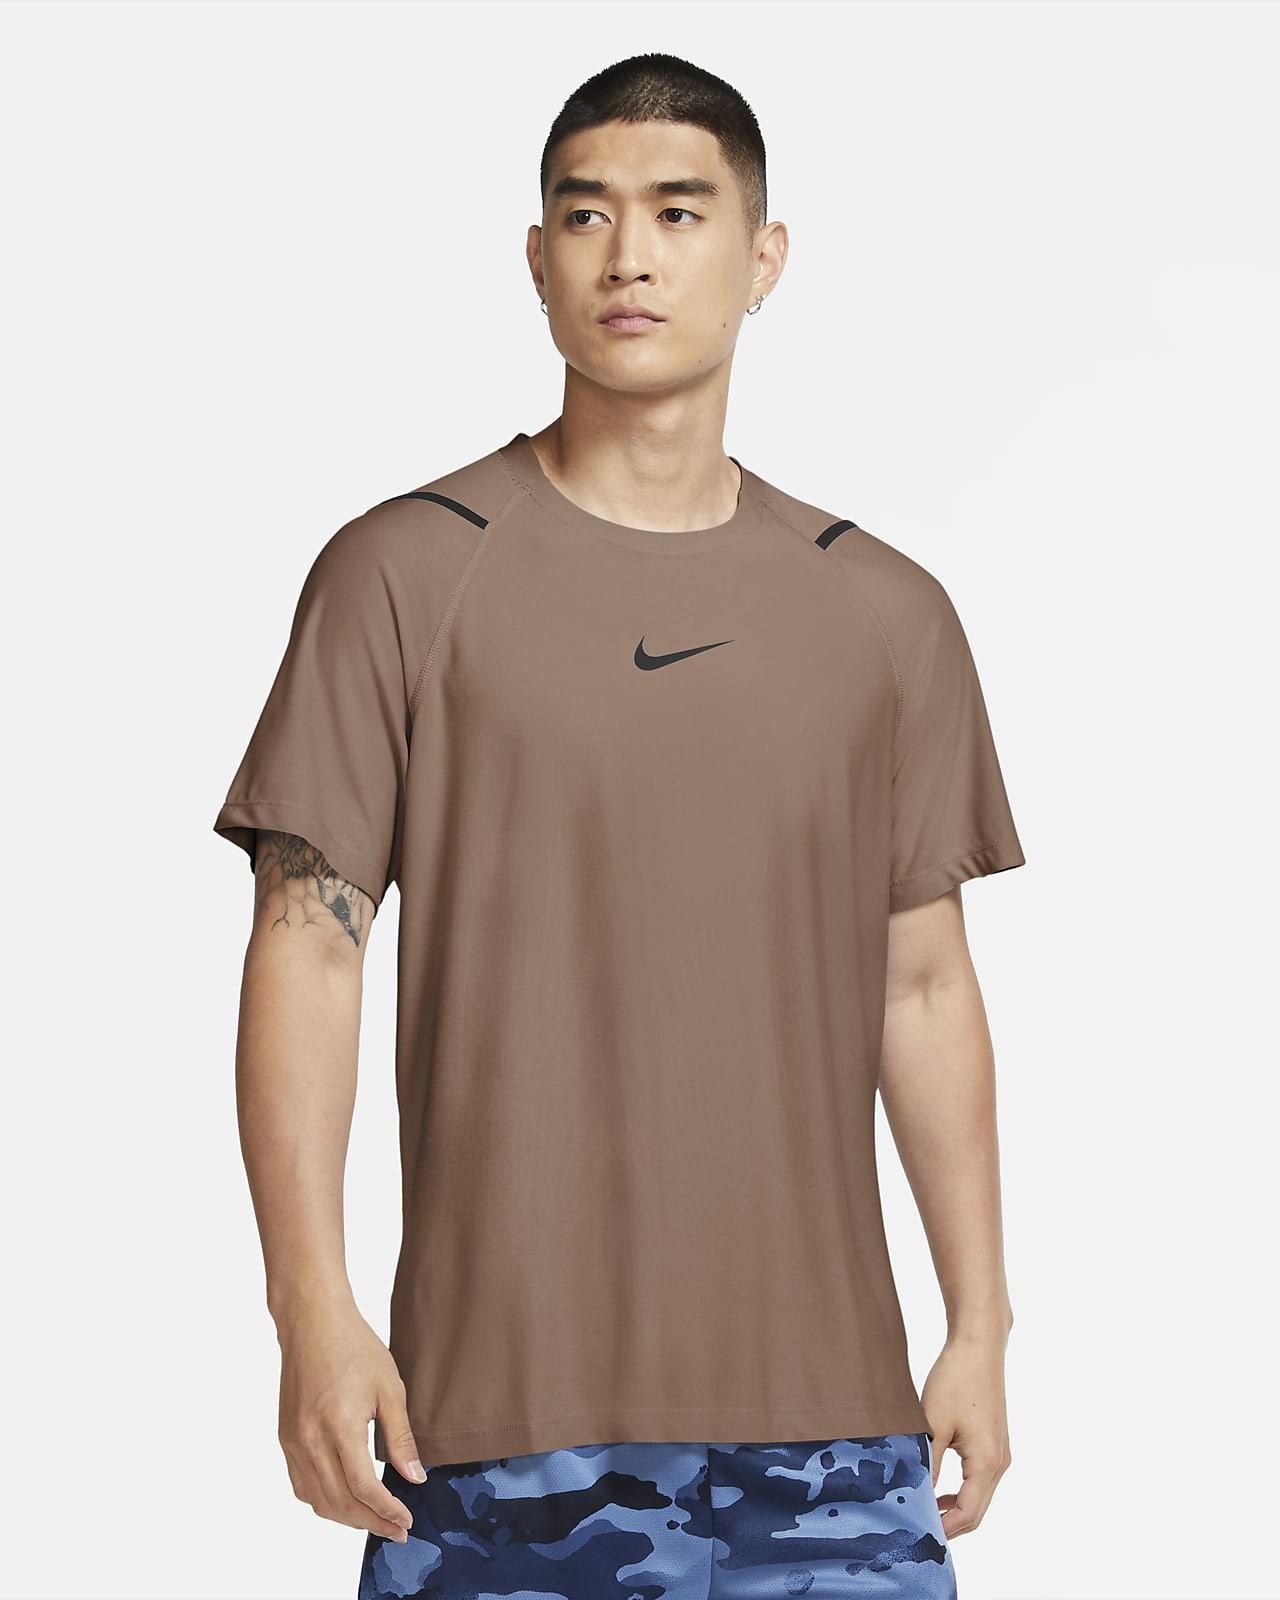 Nike Pro Camiseta de manga corta - Hombre